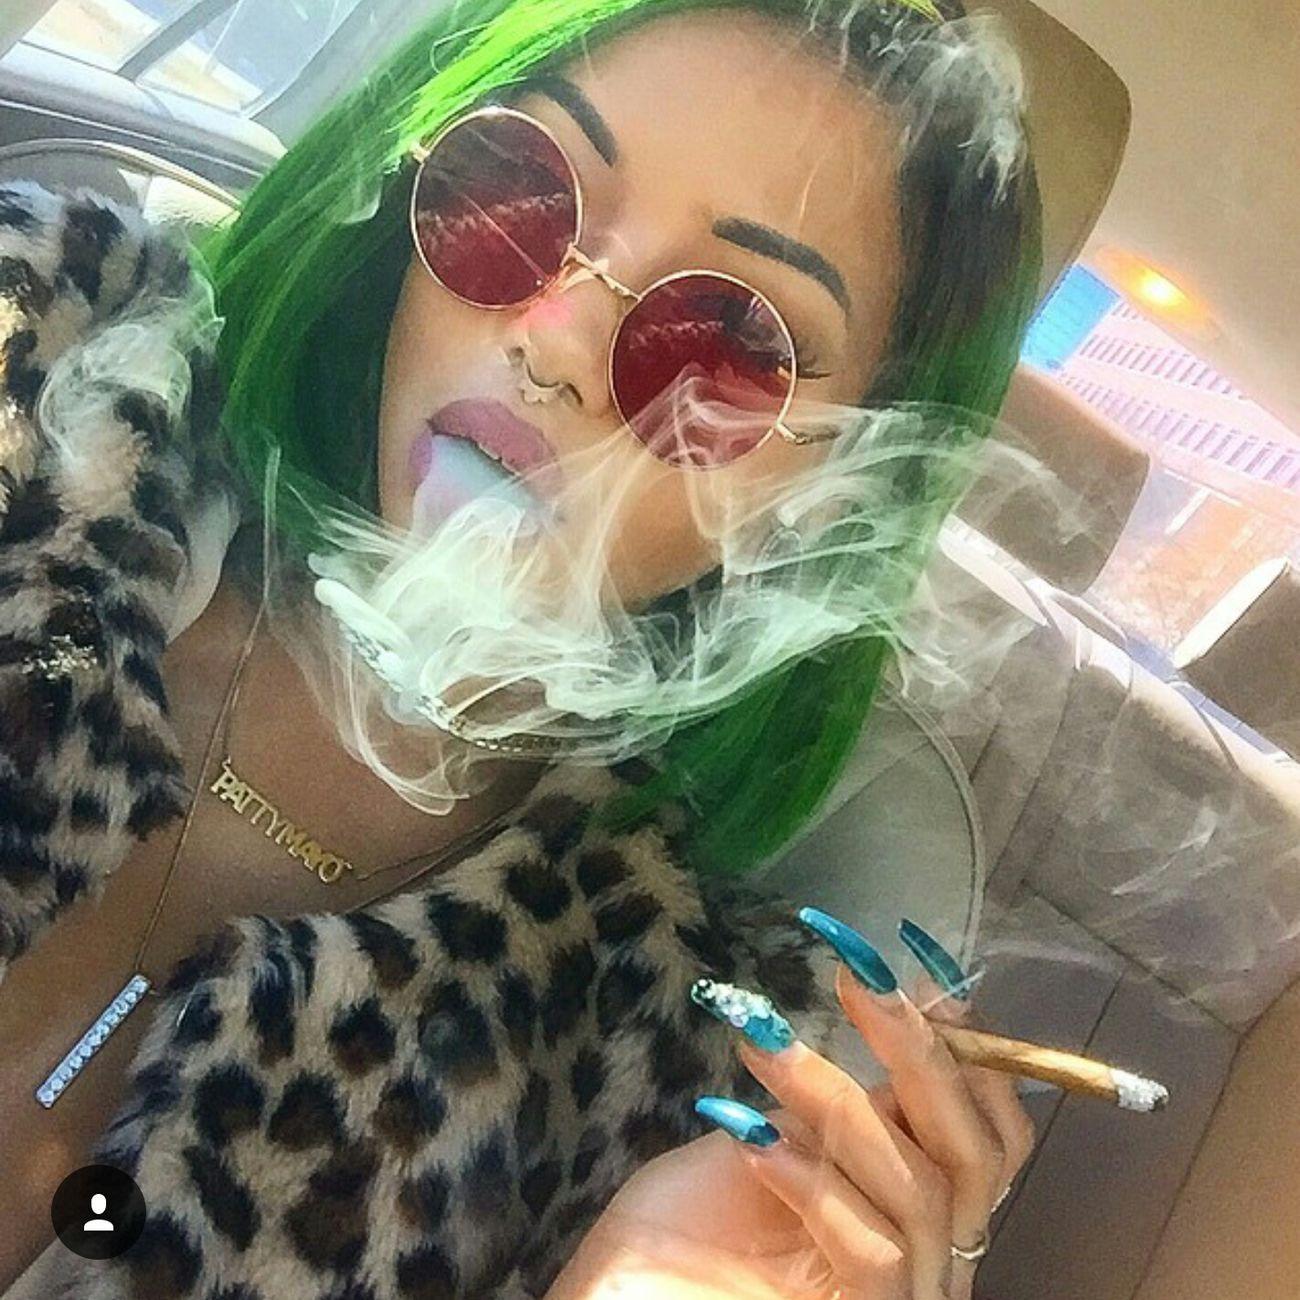 Pattyeffinmayo High Life Photography Gorgeous Aesthetics Urban Fashion Urbanstyle Weed Weed Life Long Nails Nails Blunt Fashion Makeup Eyebrows On Fleek Green Hair Smoking